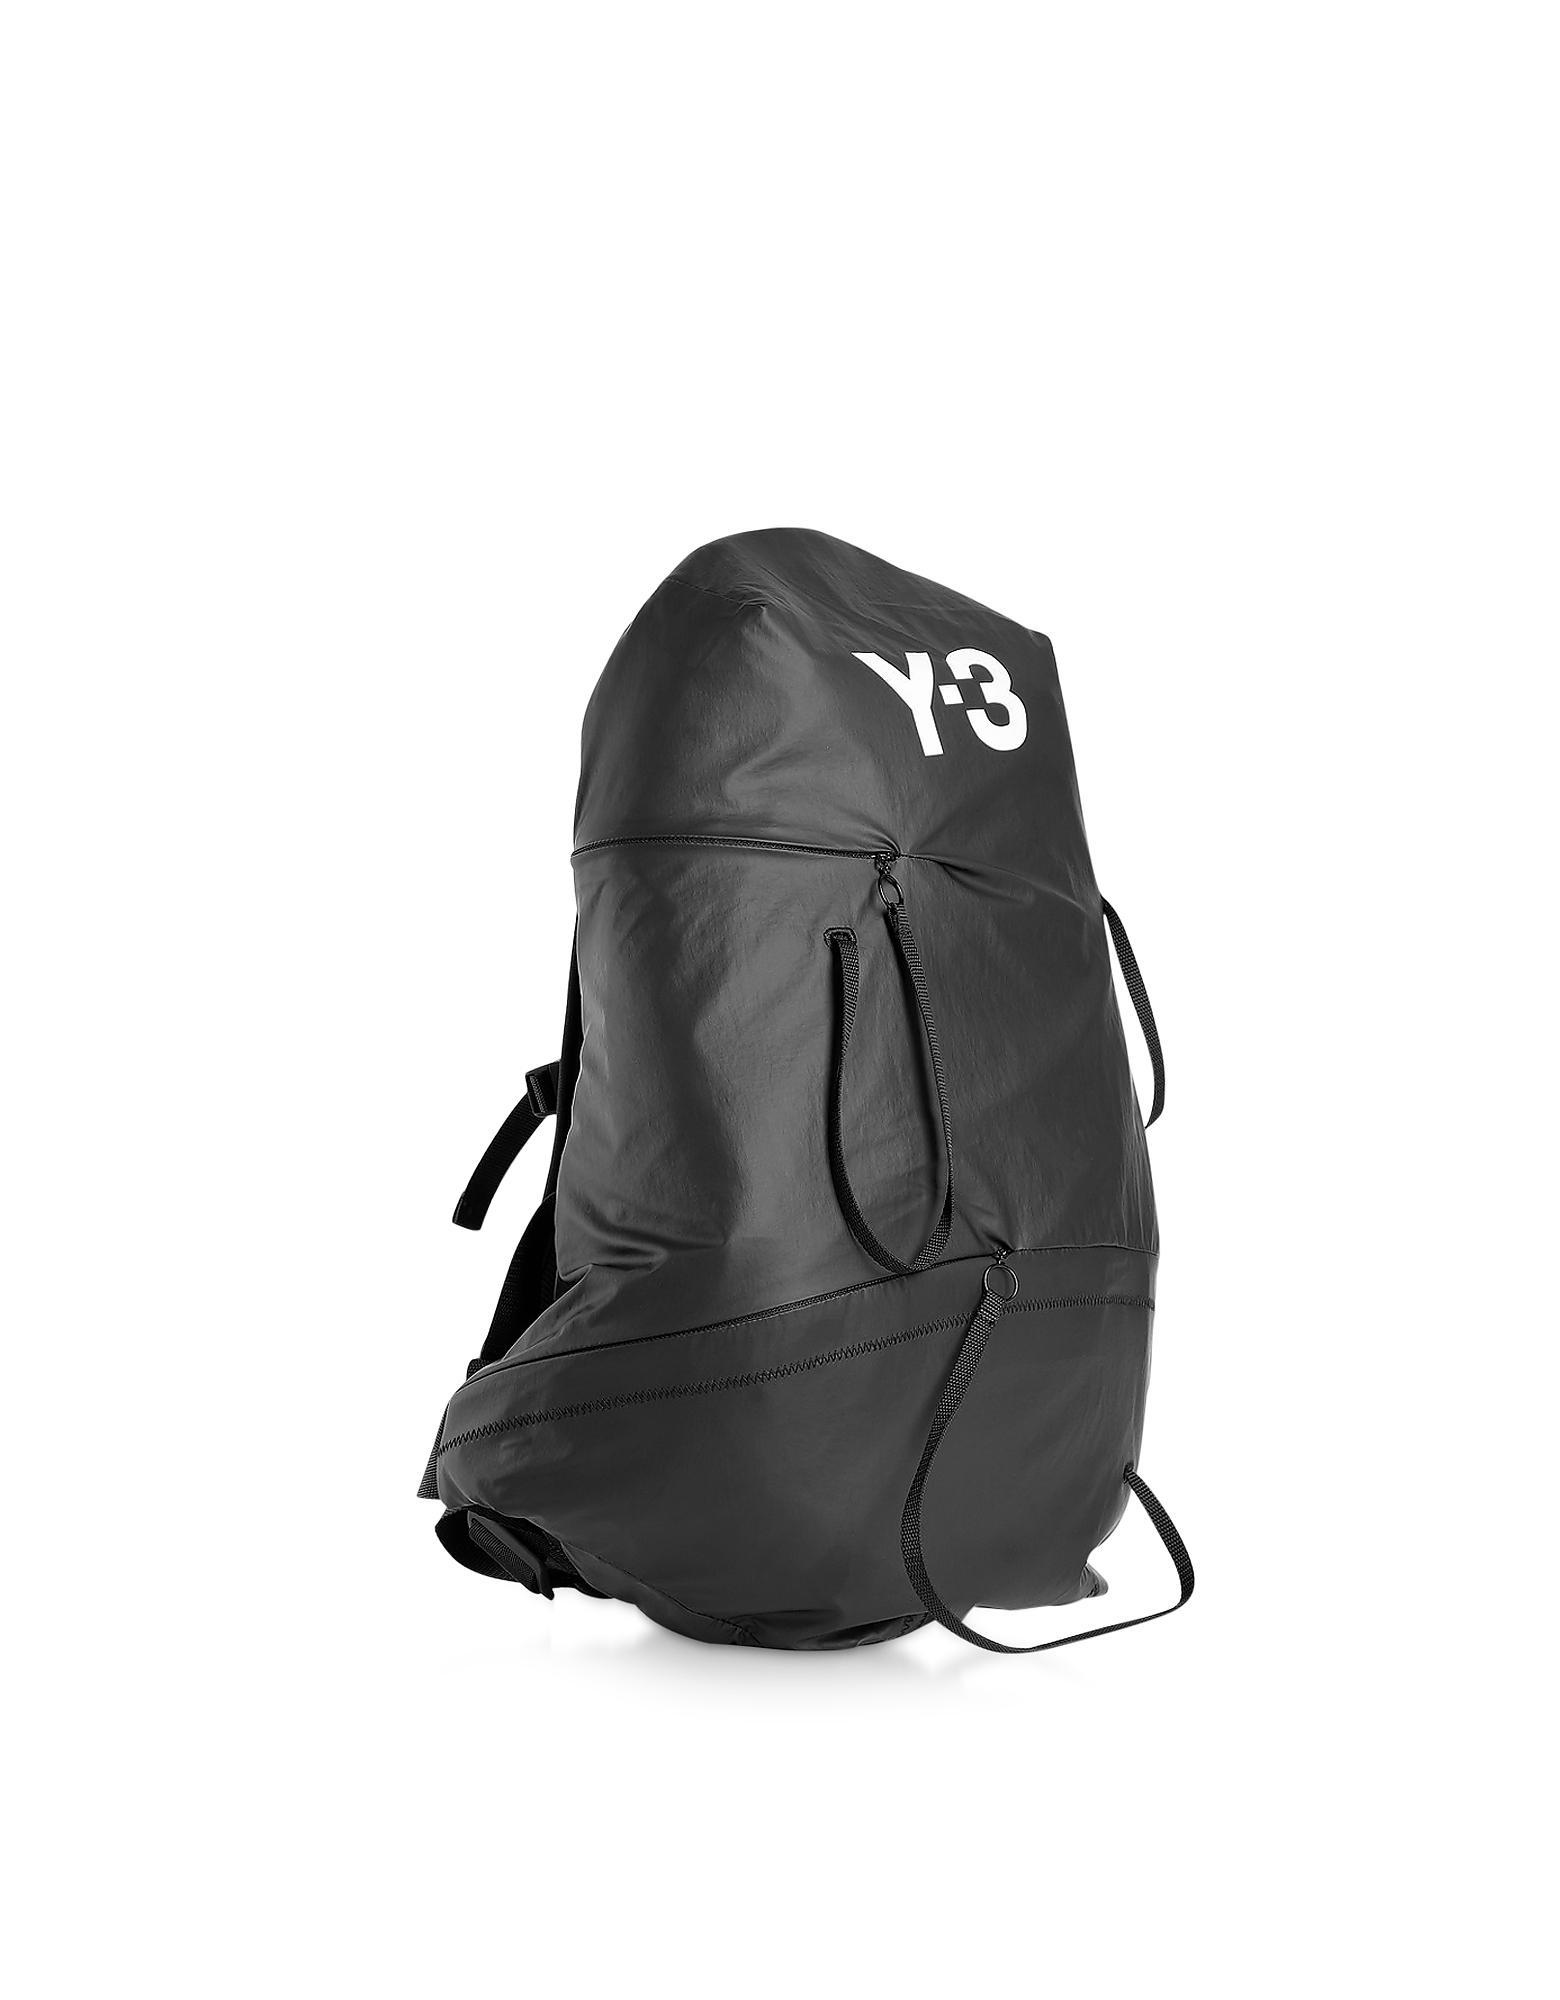 Lyst - Y-3 Black Bungee Backpack in Black for Men f95e7d04d083c